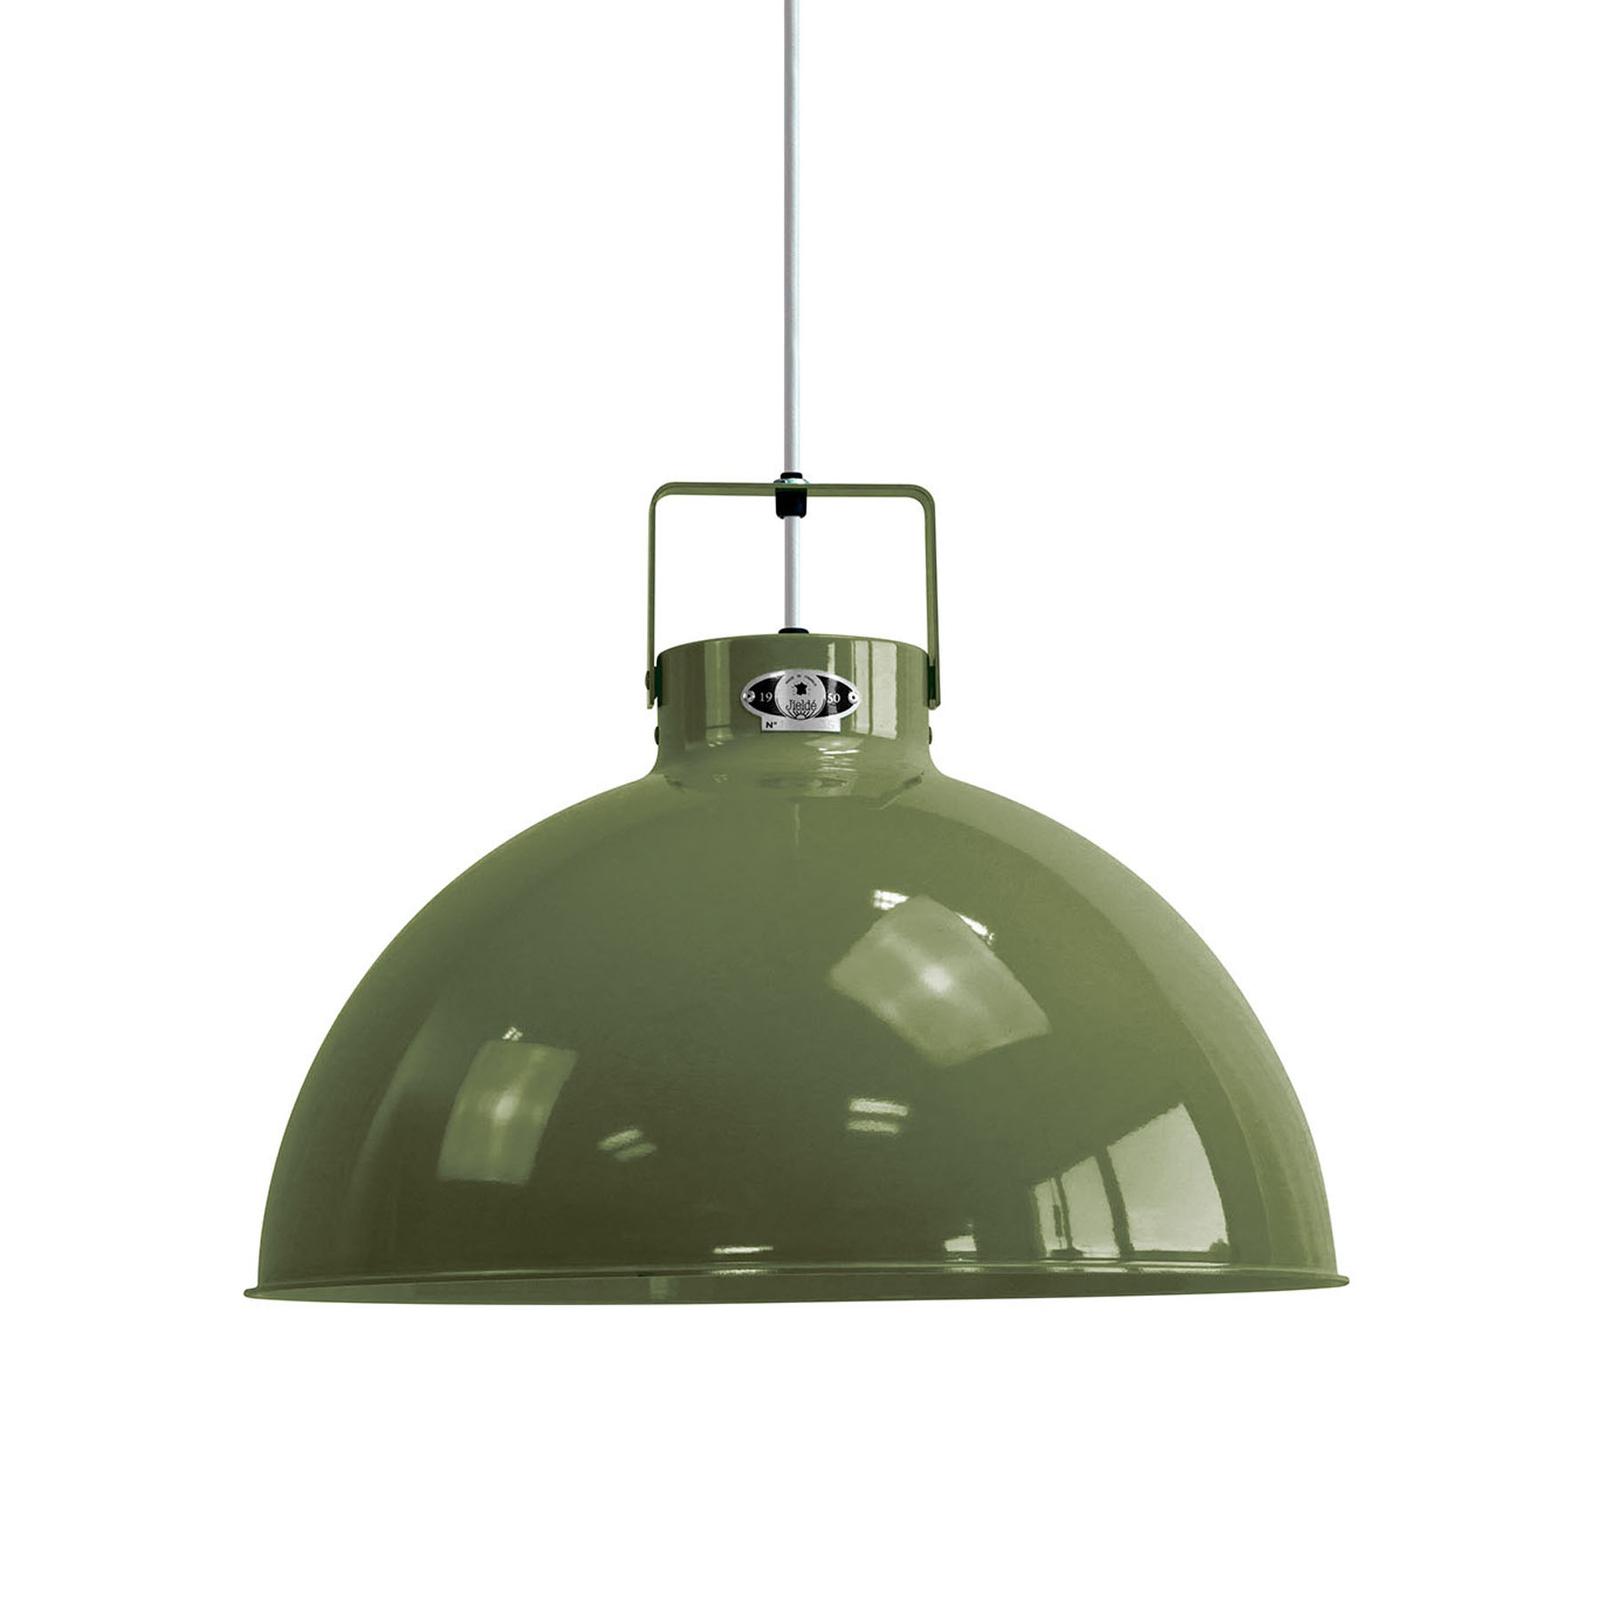 Jieldé Dante D450 lampa wisząca, oliwkowa, Ø 45 cm